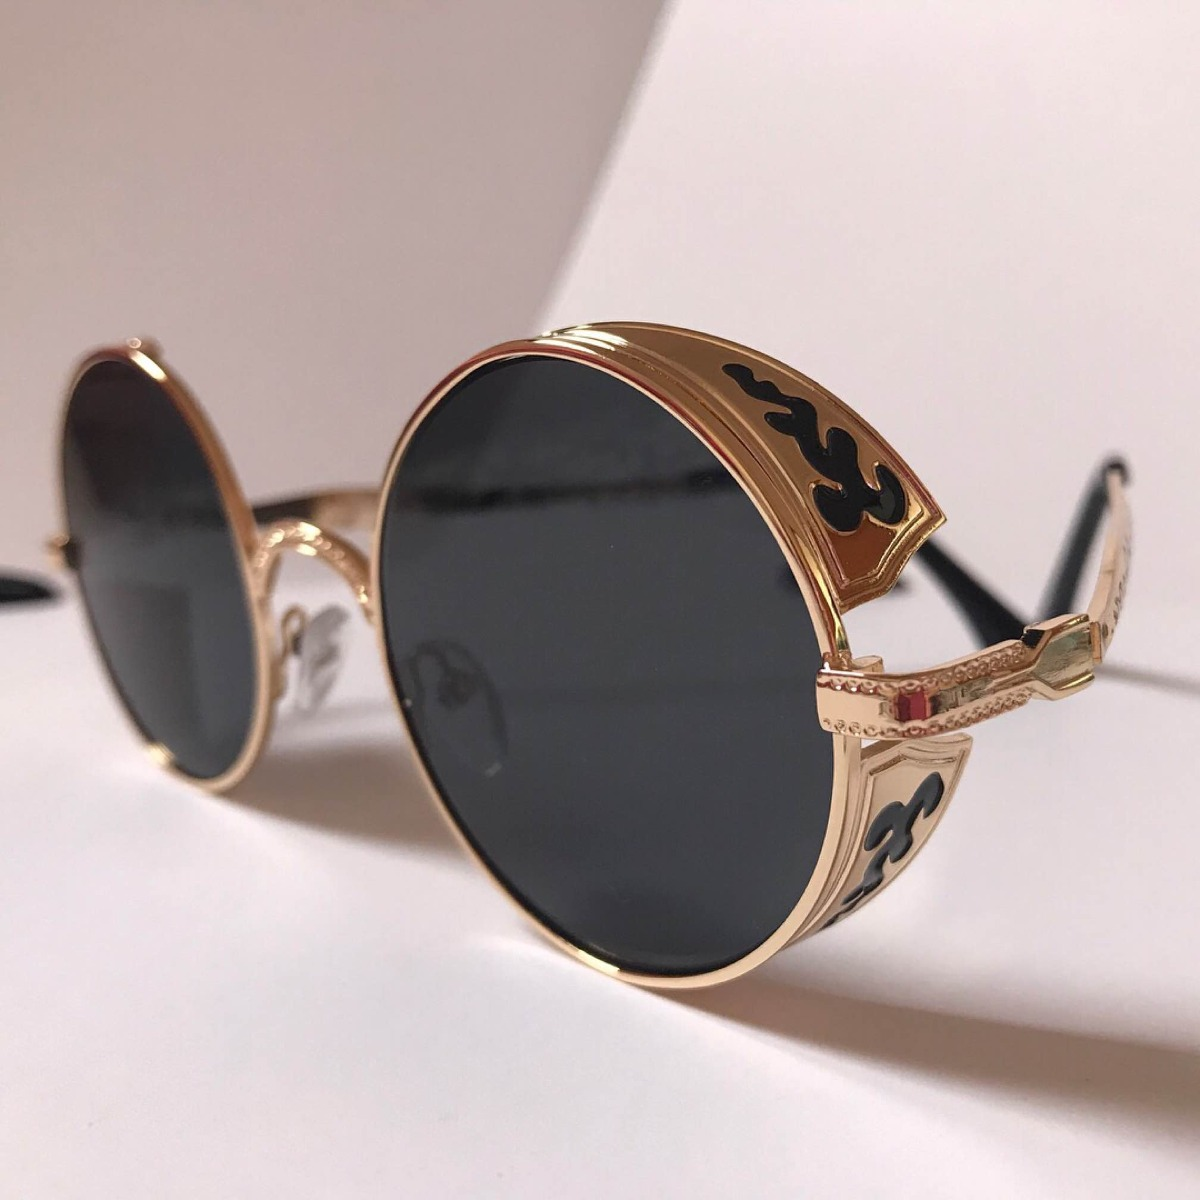 Óculos De Sol Steampunk Redondo Vintage - Frete Grátis - R  85,00 em ... a78c8d0058